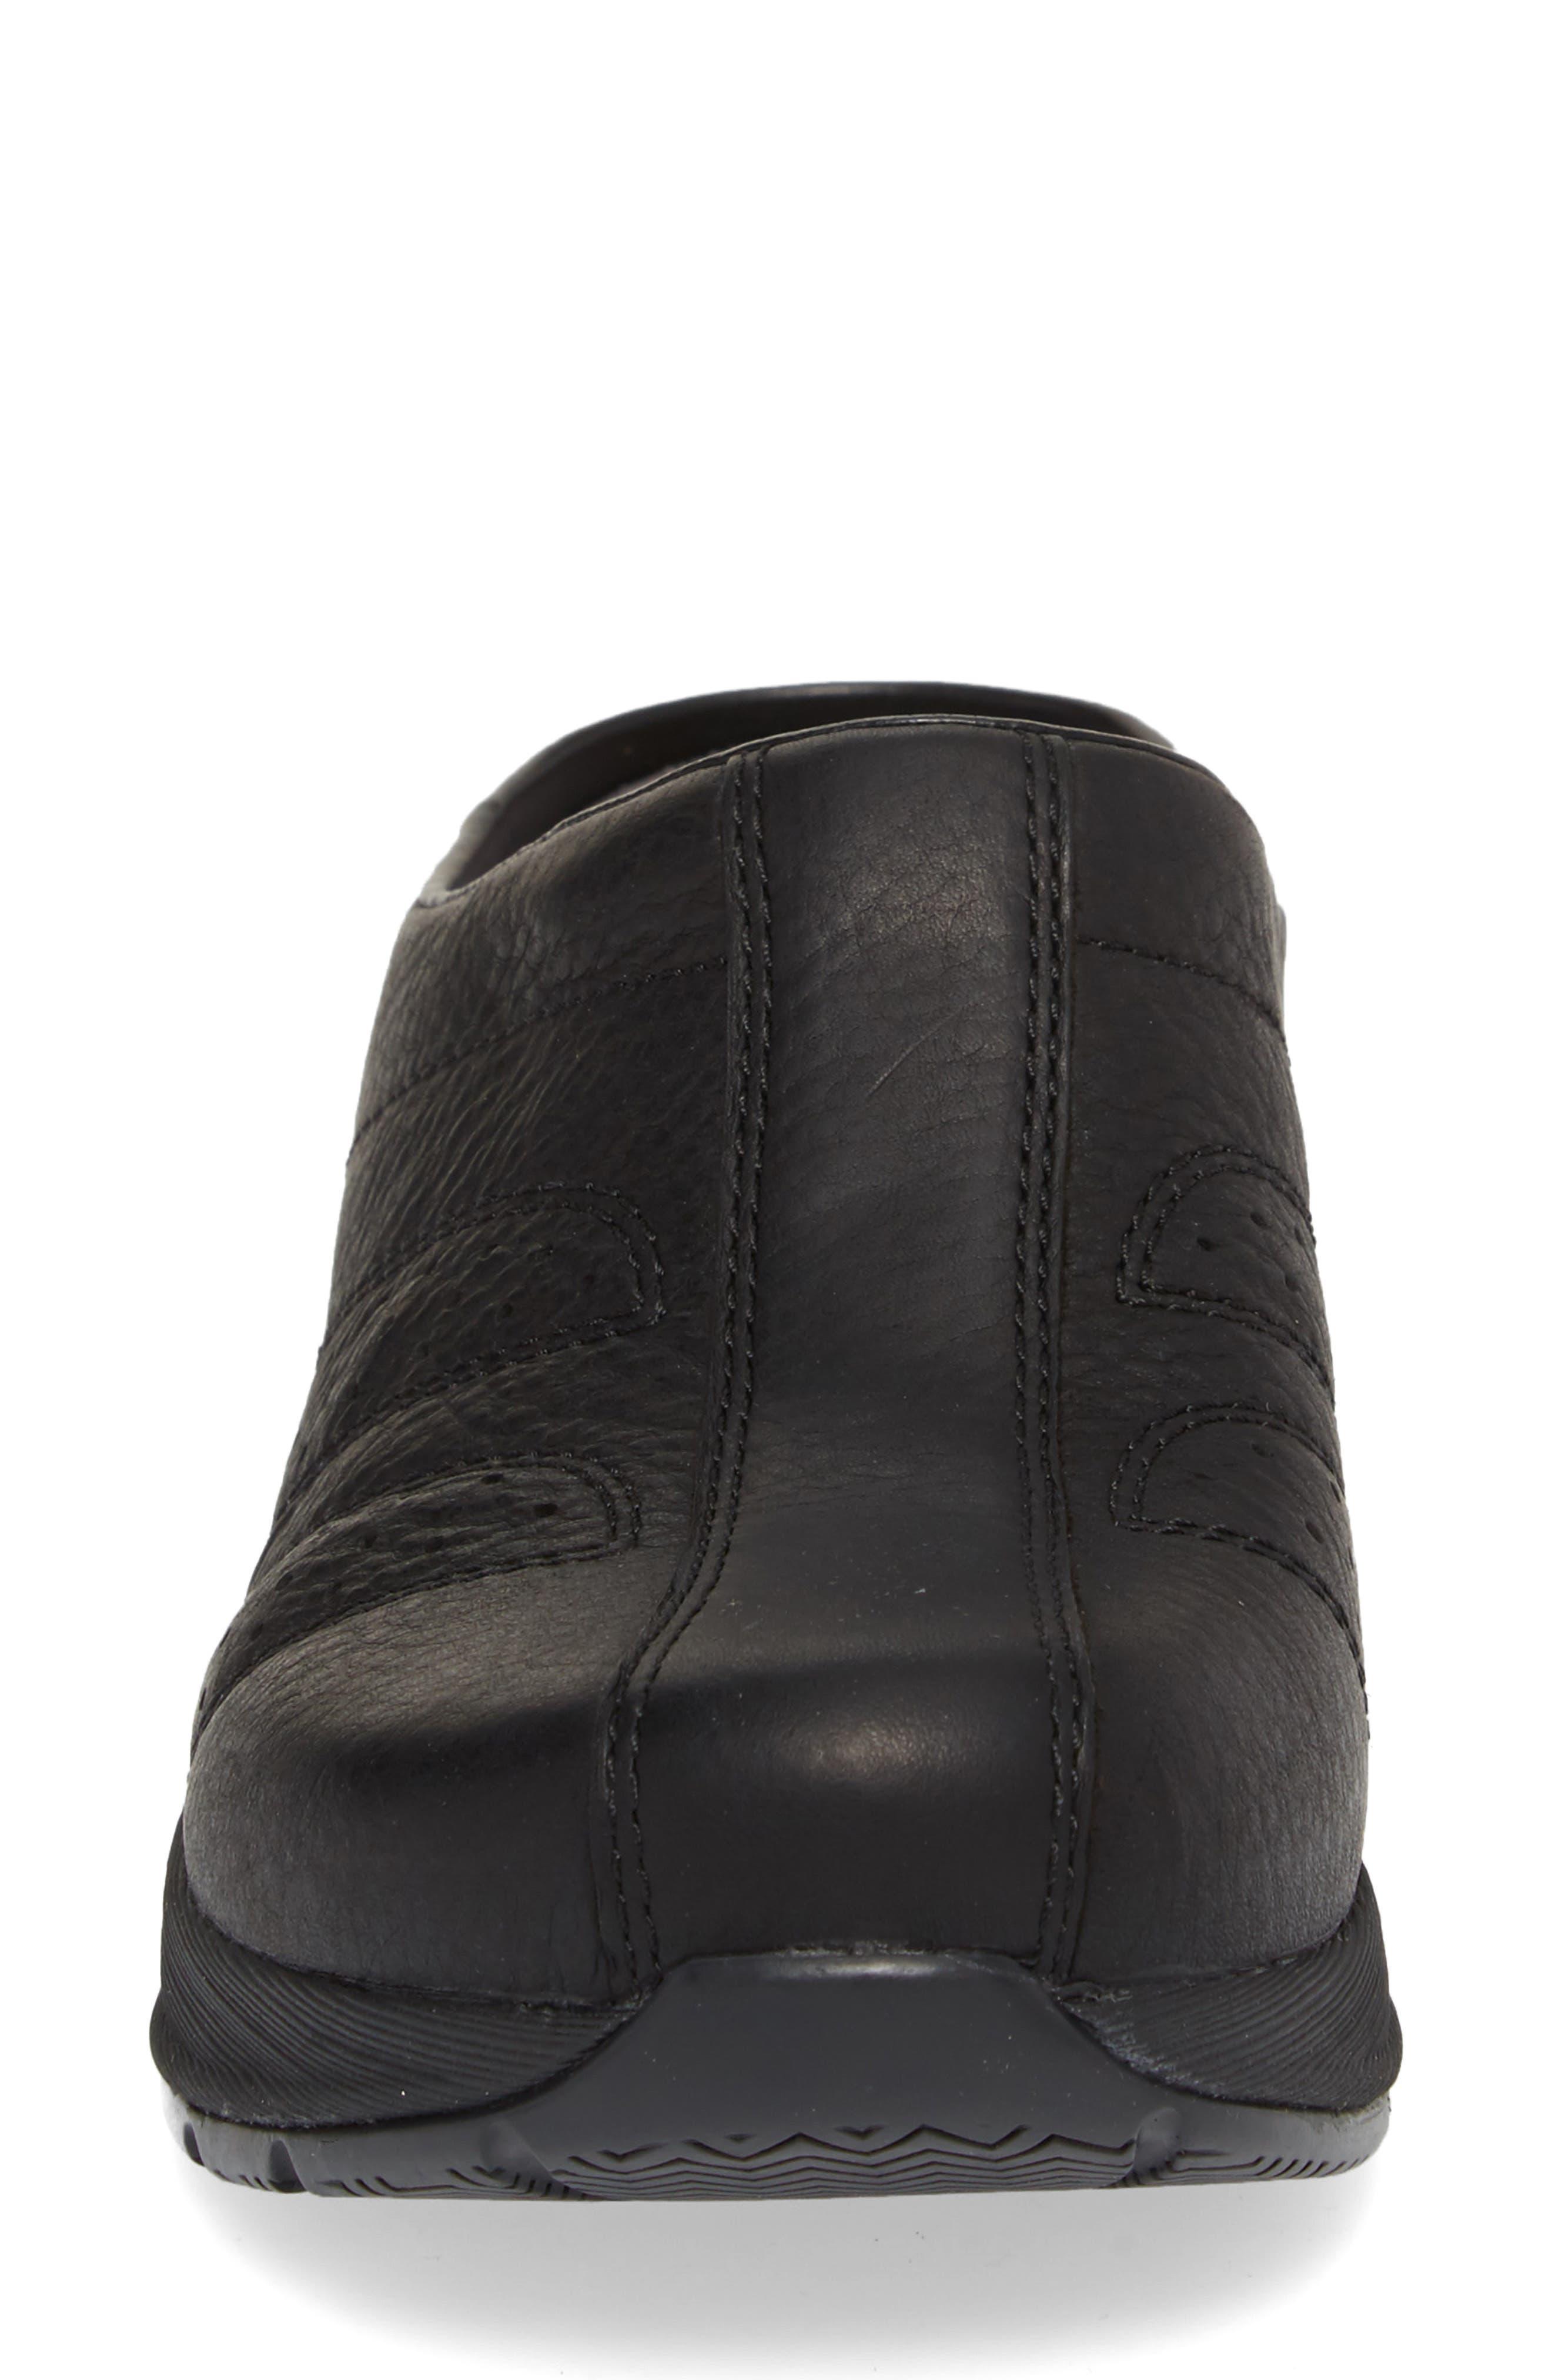 Dankso Shelly Mule,                             Alternate thumbnail 4, color,                             Black Leather